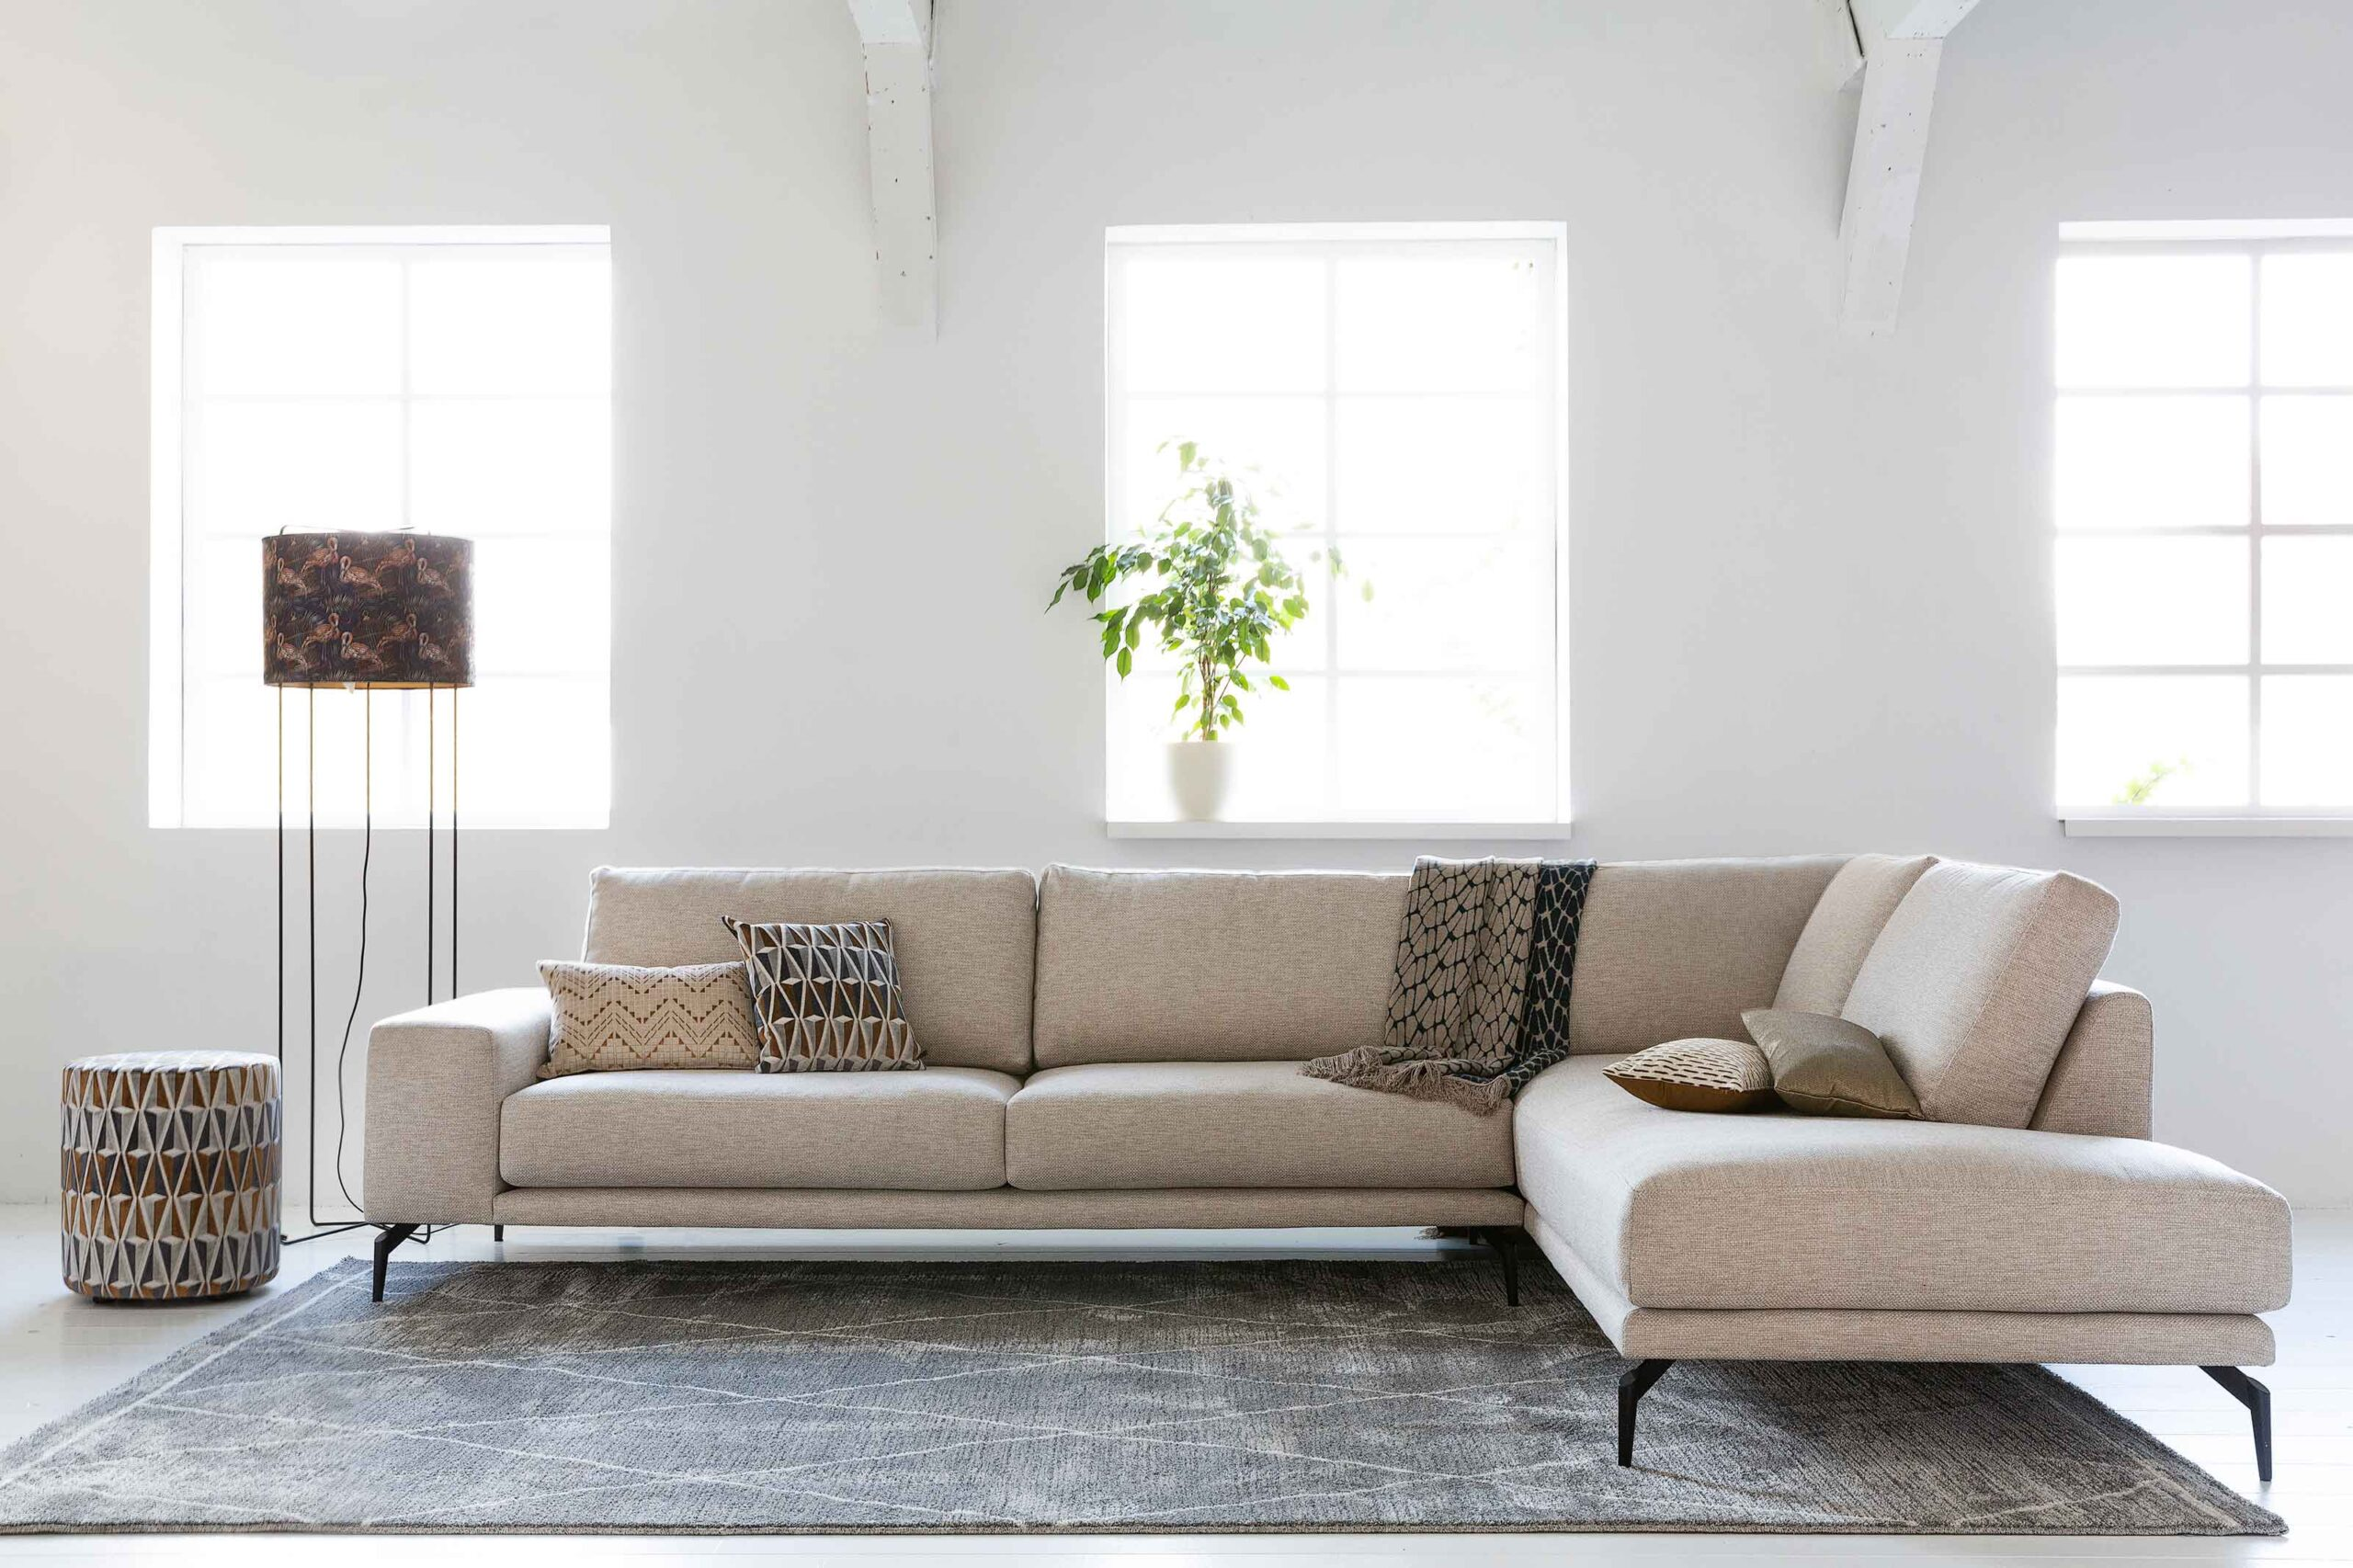 bella-milano-hoekbank-ottoman-strak-design-witte-grove-stof-soofs-interieur